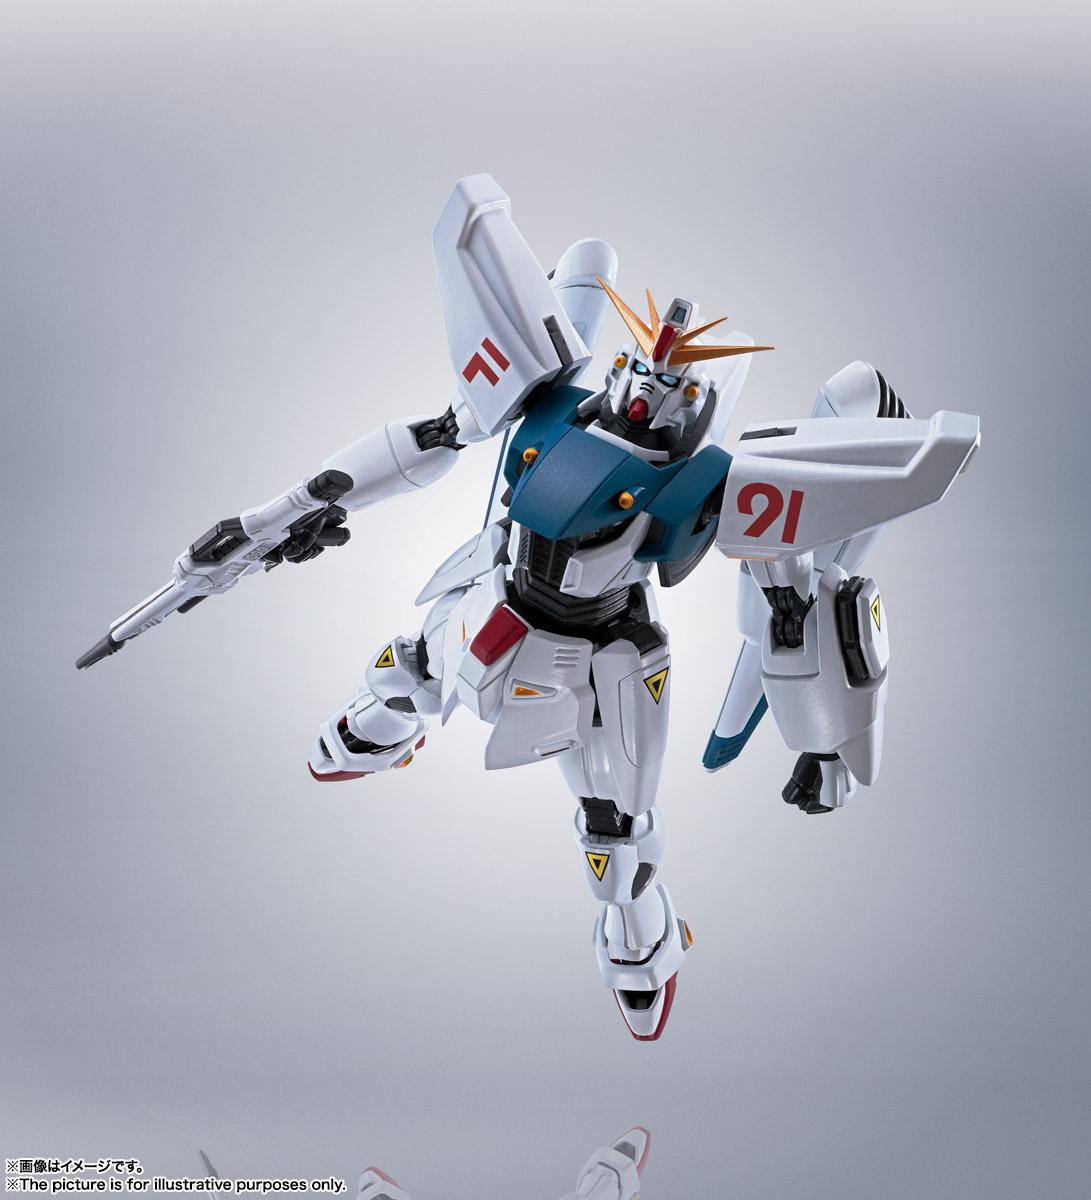 ROBOT魂〈SIDE MS〉『ガンダムF91 EVOLUTION-SPEC』機動戦士ガンダムF91 可動フィギュア-012